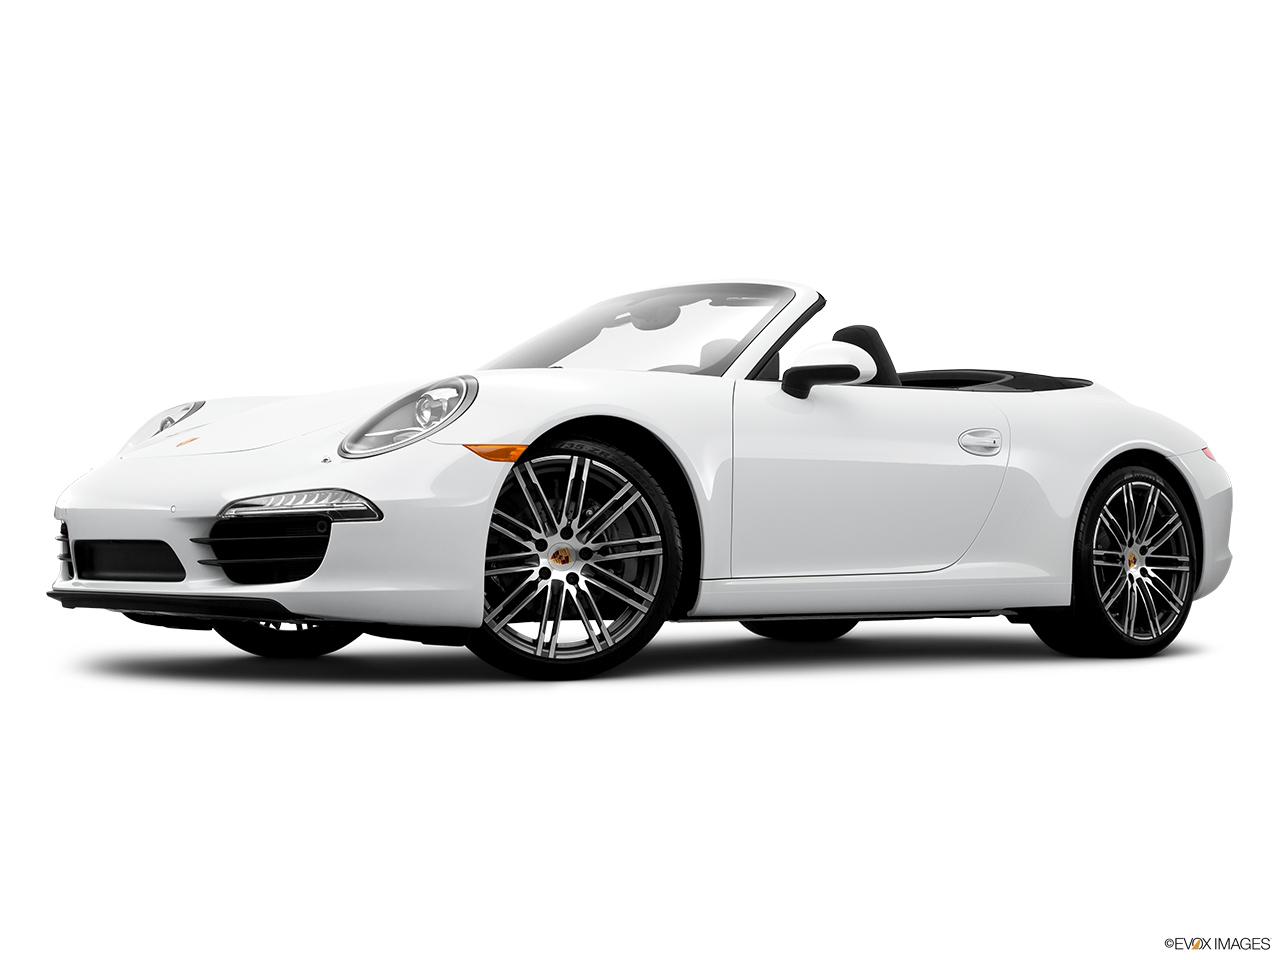 2016 porsche 911 2 door cabriolet carrera 4 black edition. Black Bedroom Furniture Sets. Home Design Ideas